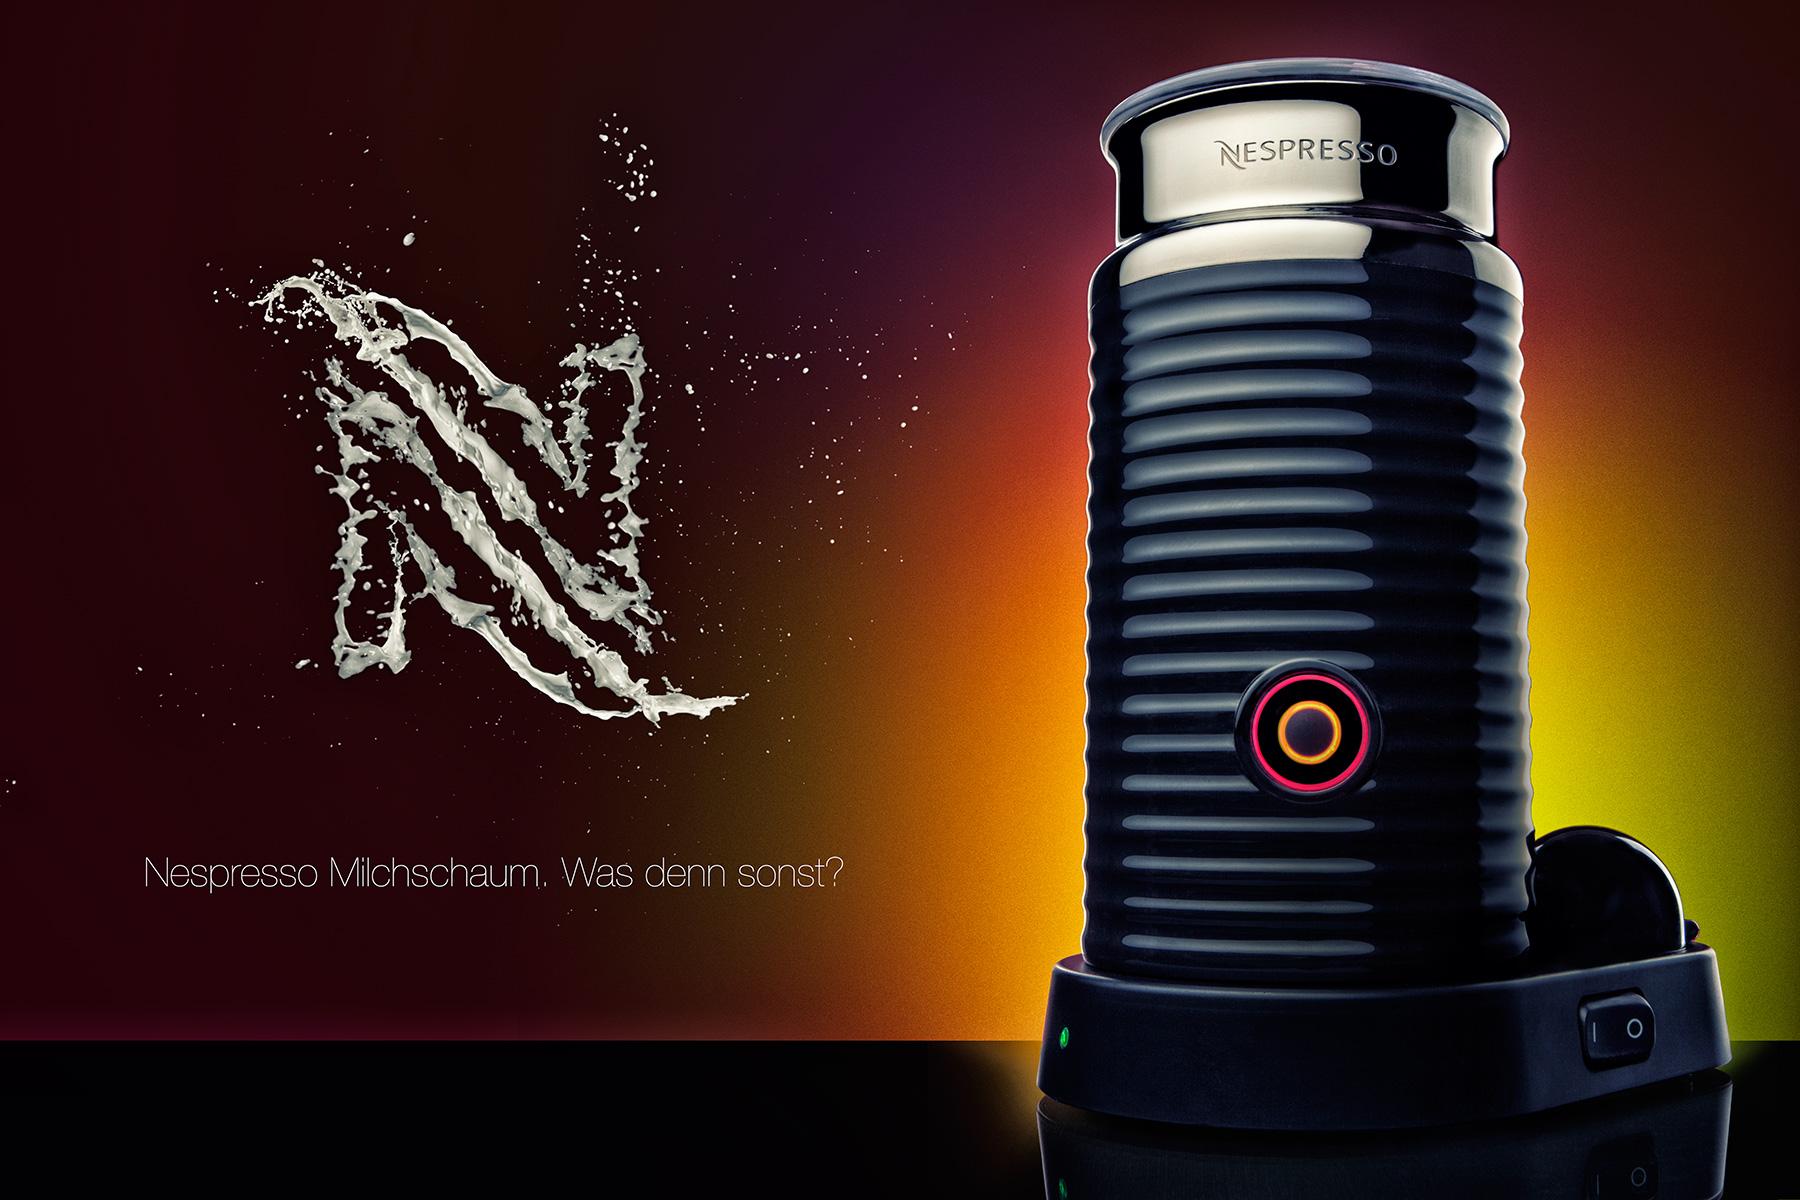 Nespresso-Produkt-Werbefotograf-Stilllife-Fotograf-Muenchen